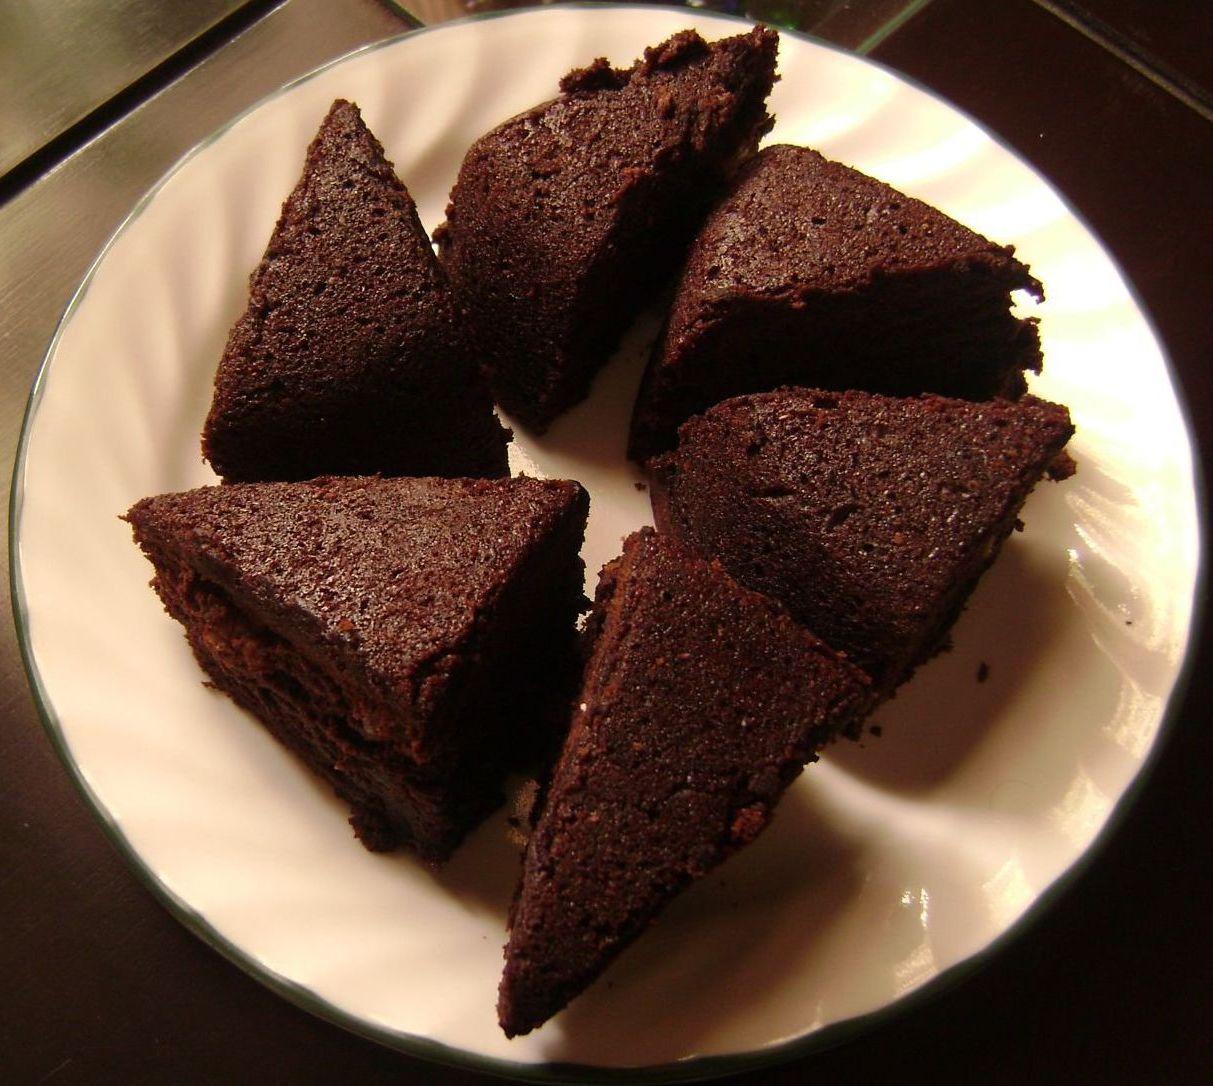 File:Home Made Chocolate Cake.jpg - Wikimedia Commons